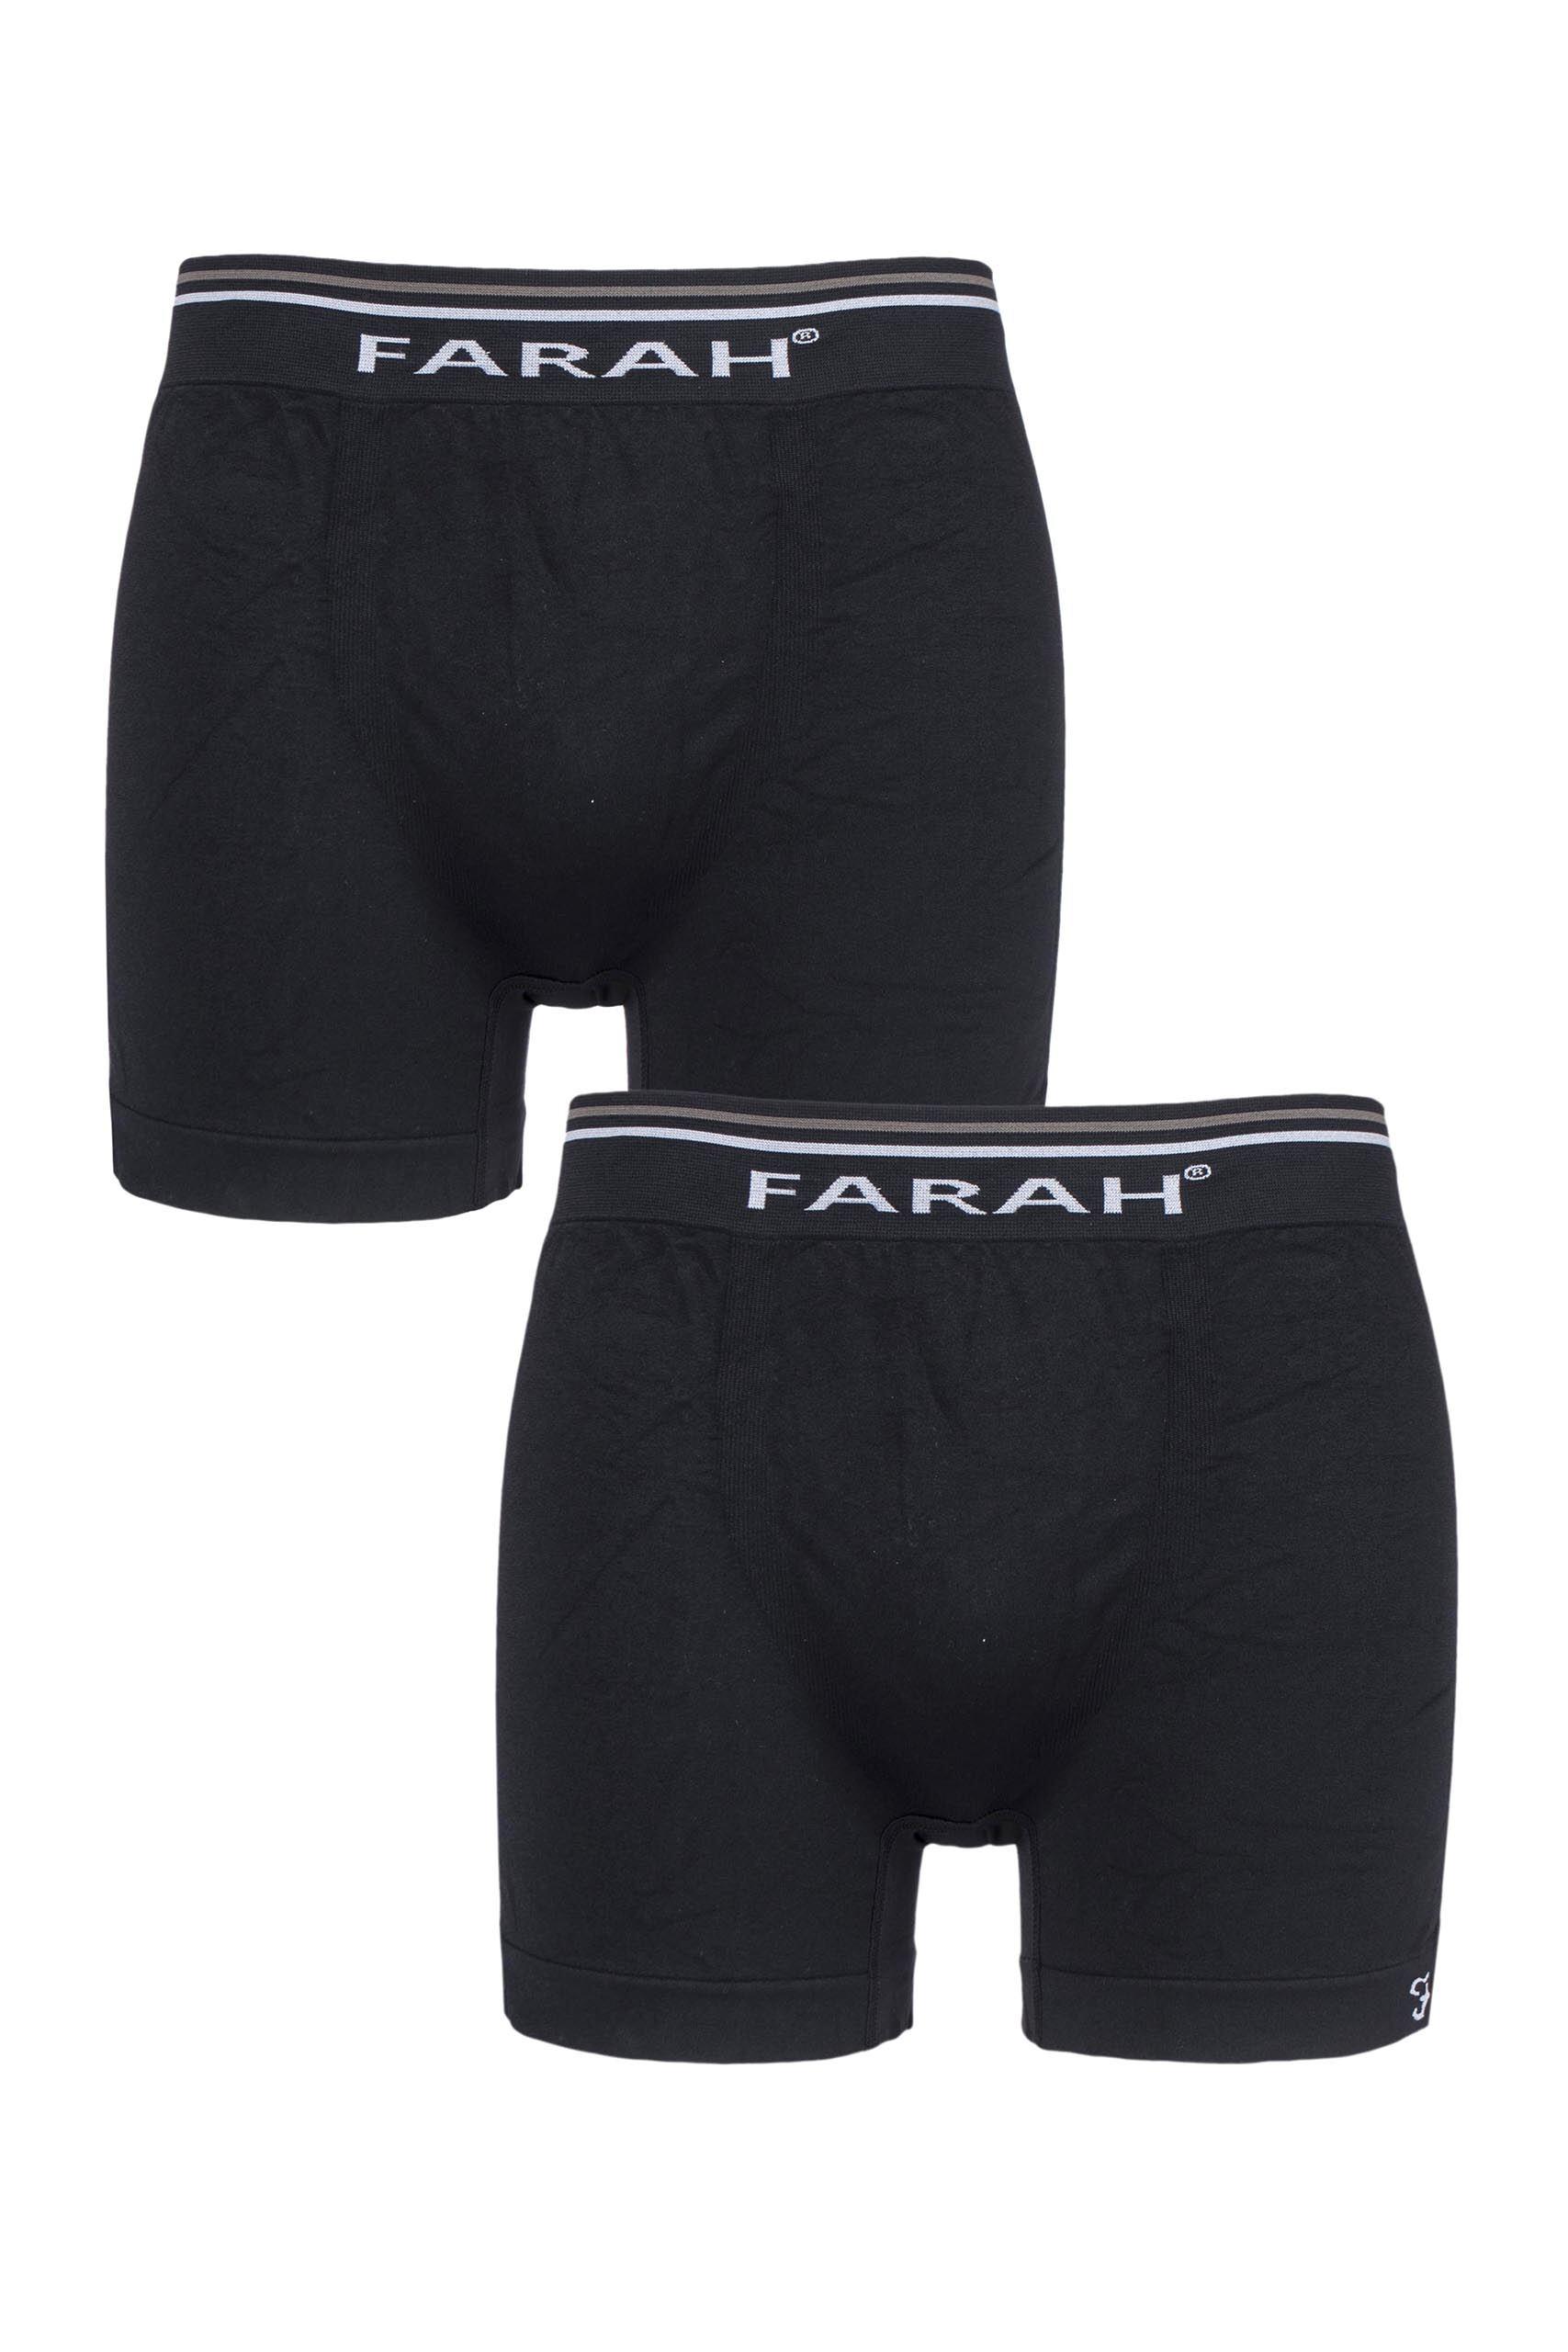 Image of 2 Pack Black Seamless Boxer Shorts Men's Large - Farah